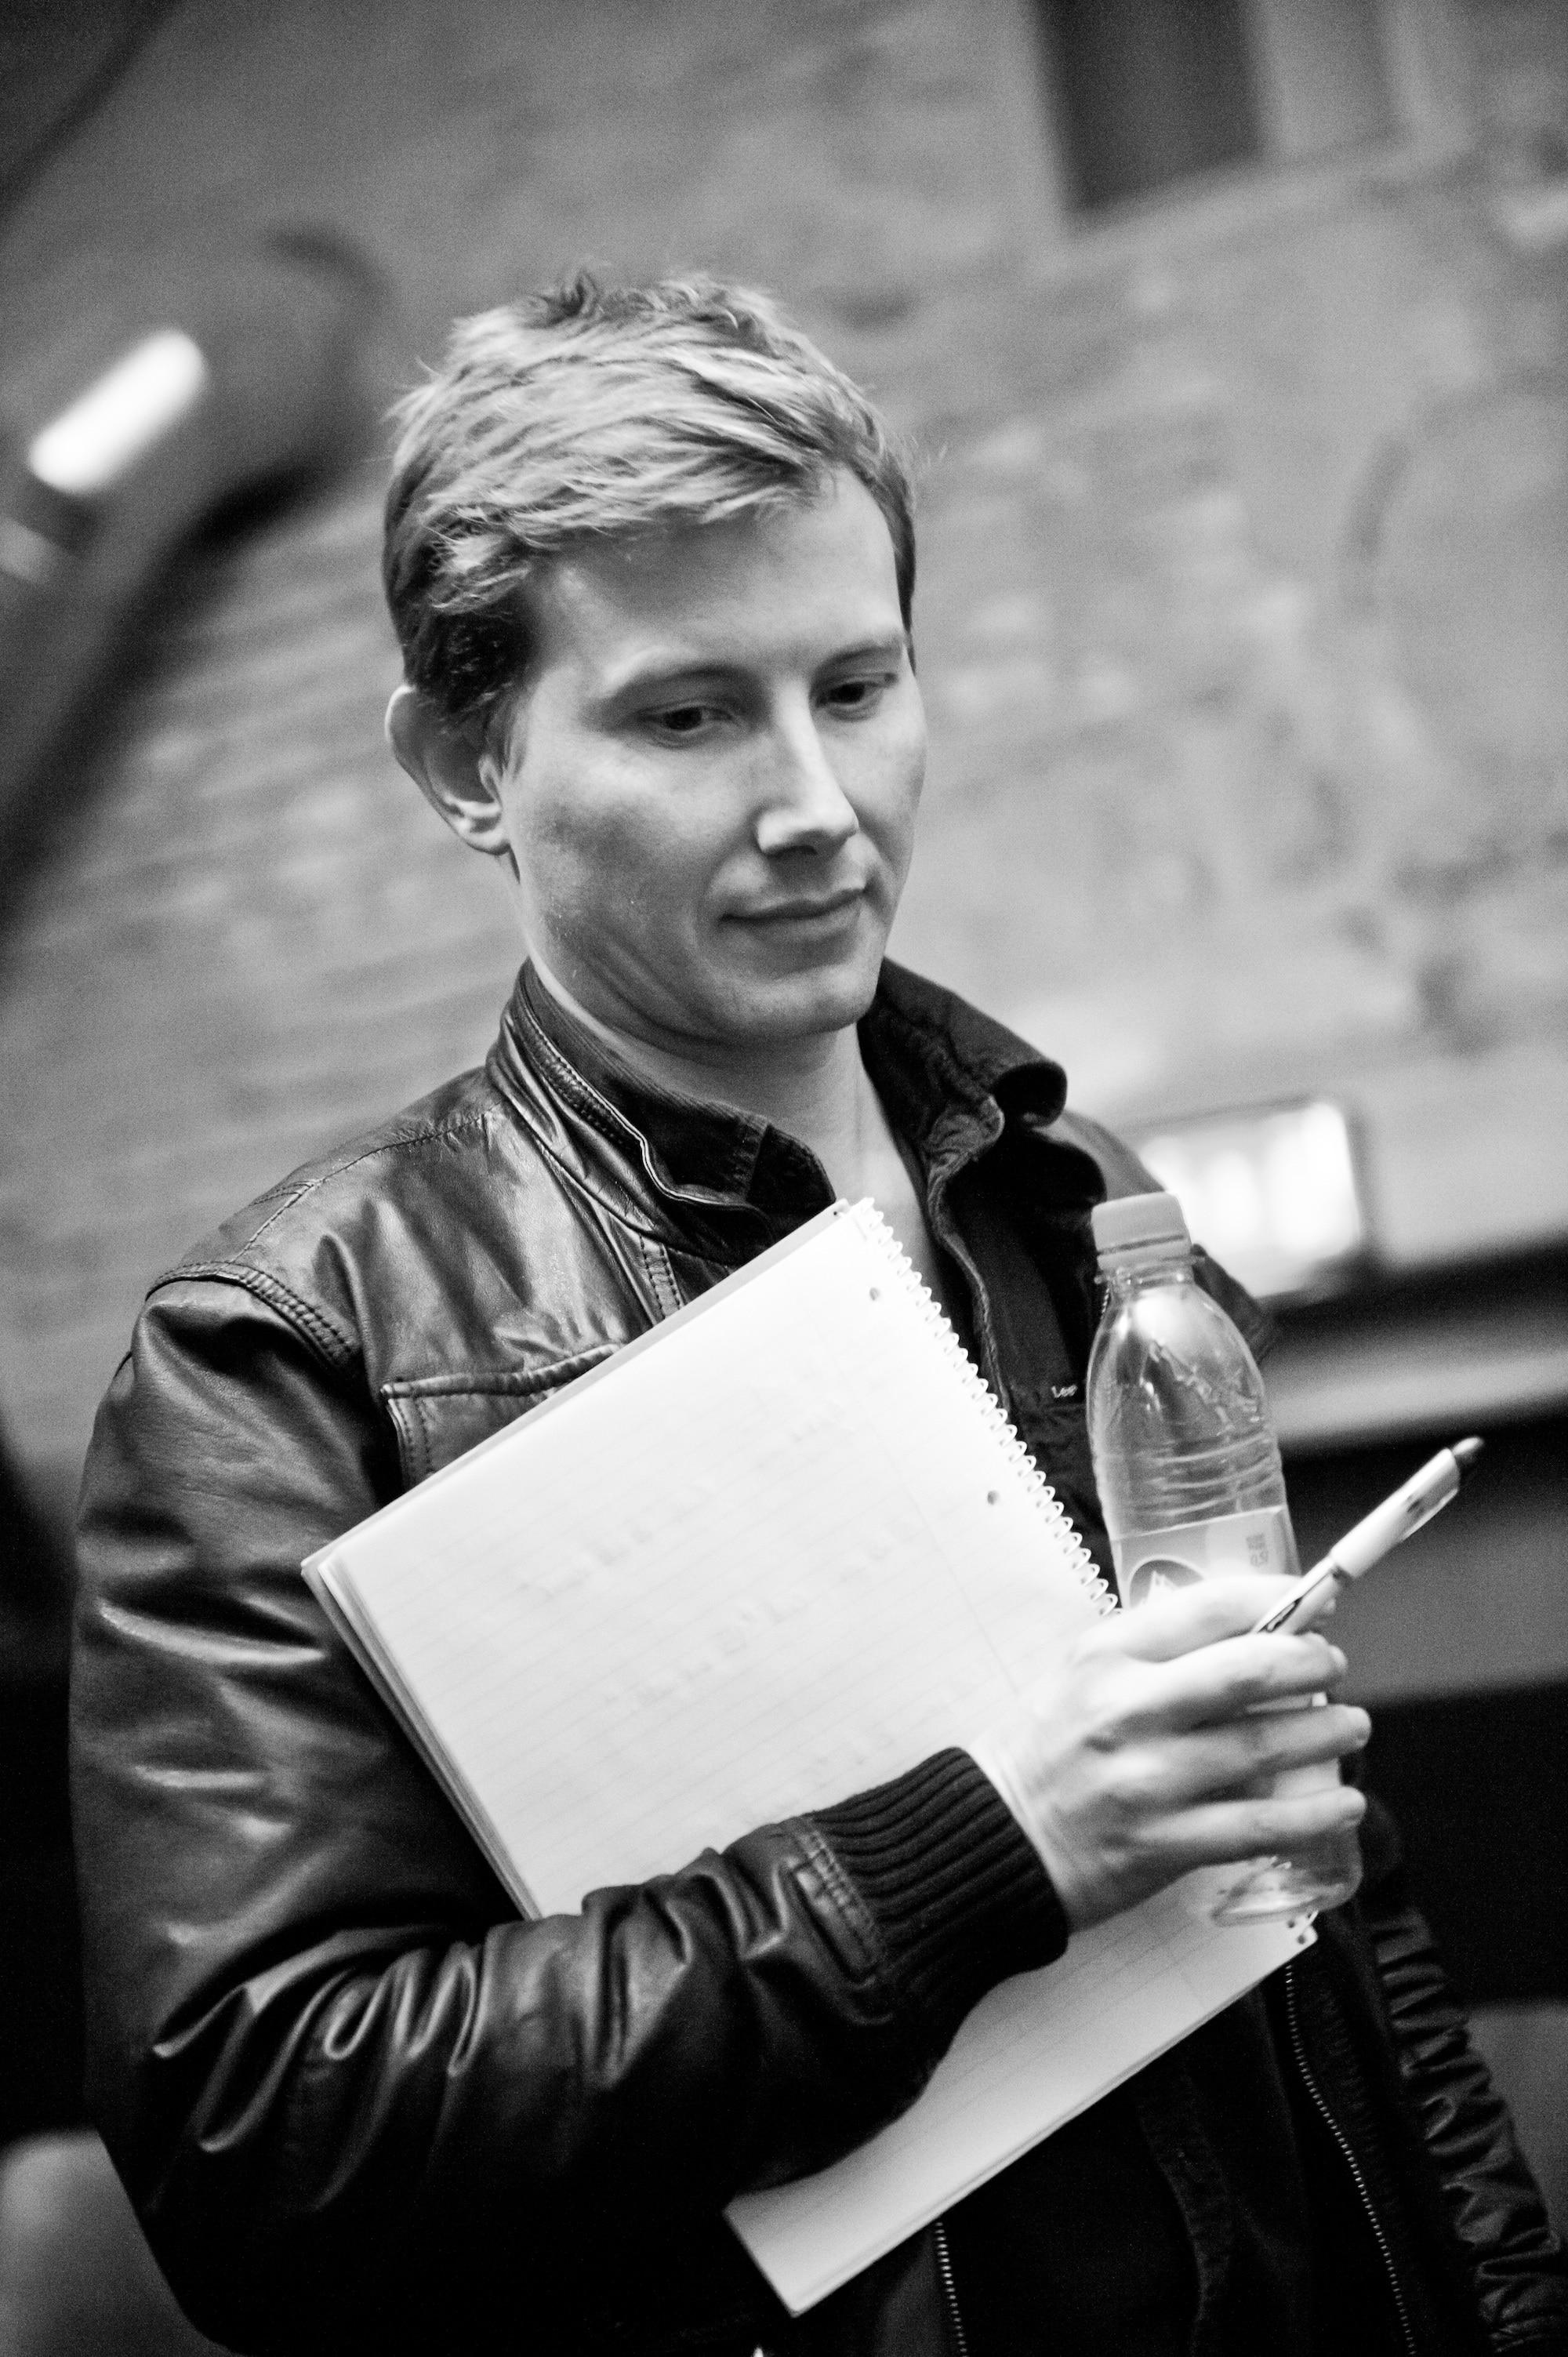 tom daley filmmaker industrial scripts